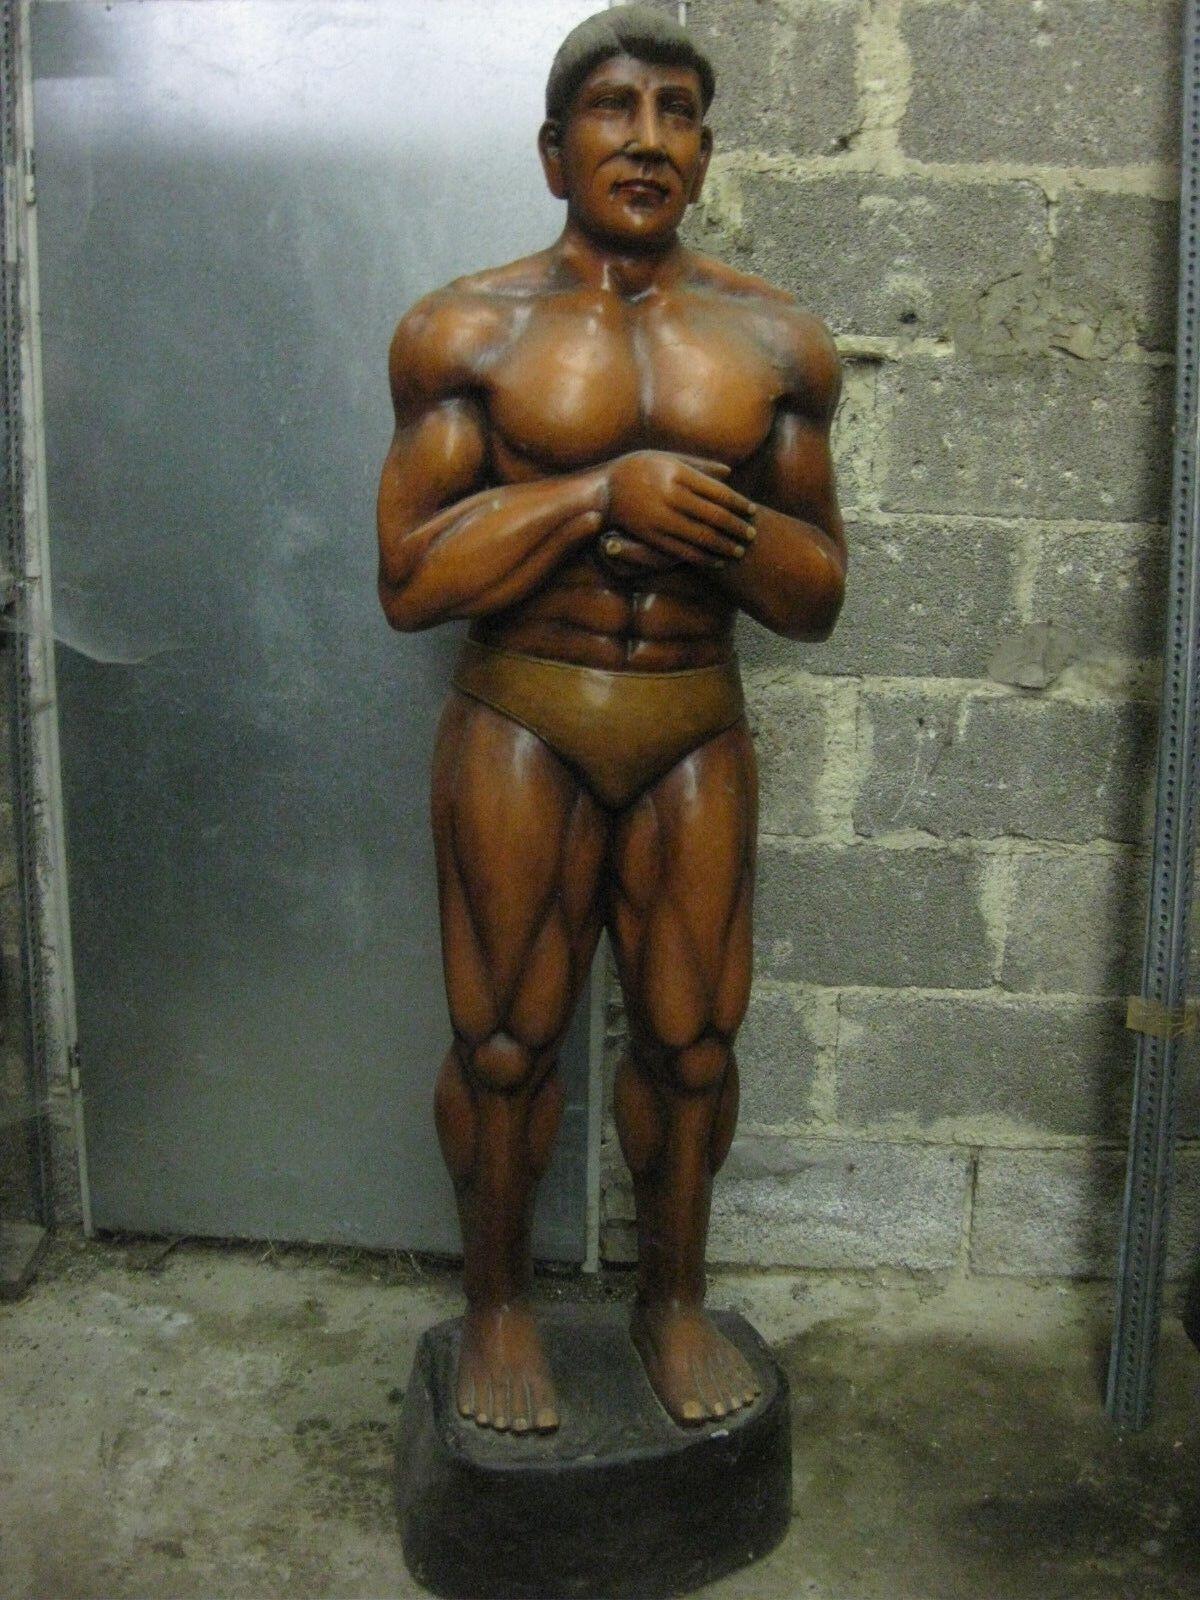 Bodybilderfigur Männerfigur Mann Holz Höhe190cm Kraftsportler Fitnessstudio